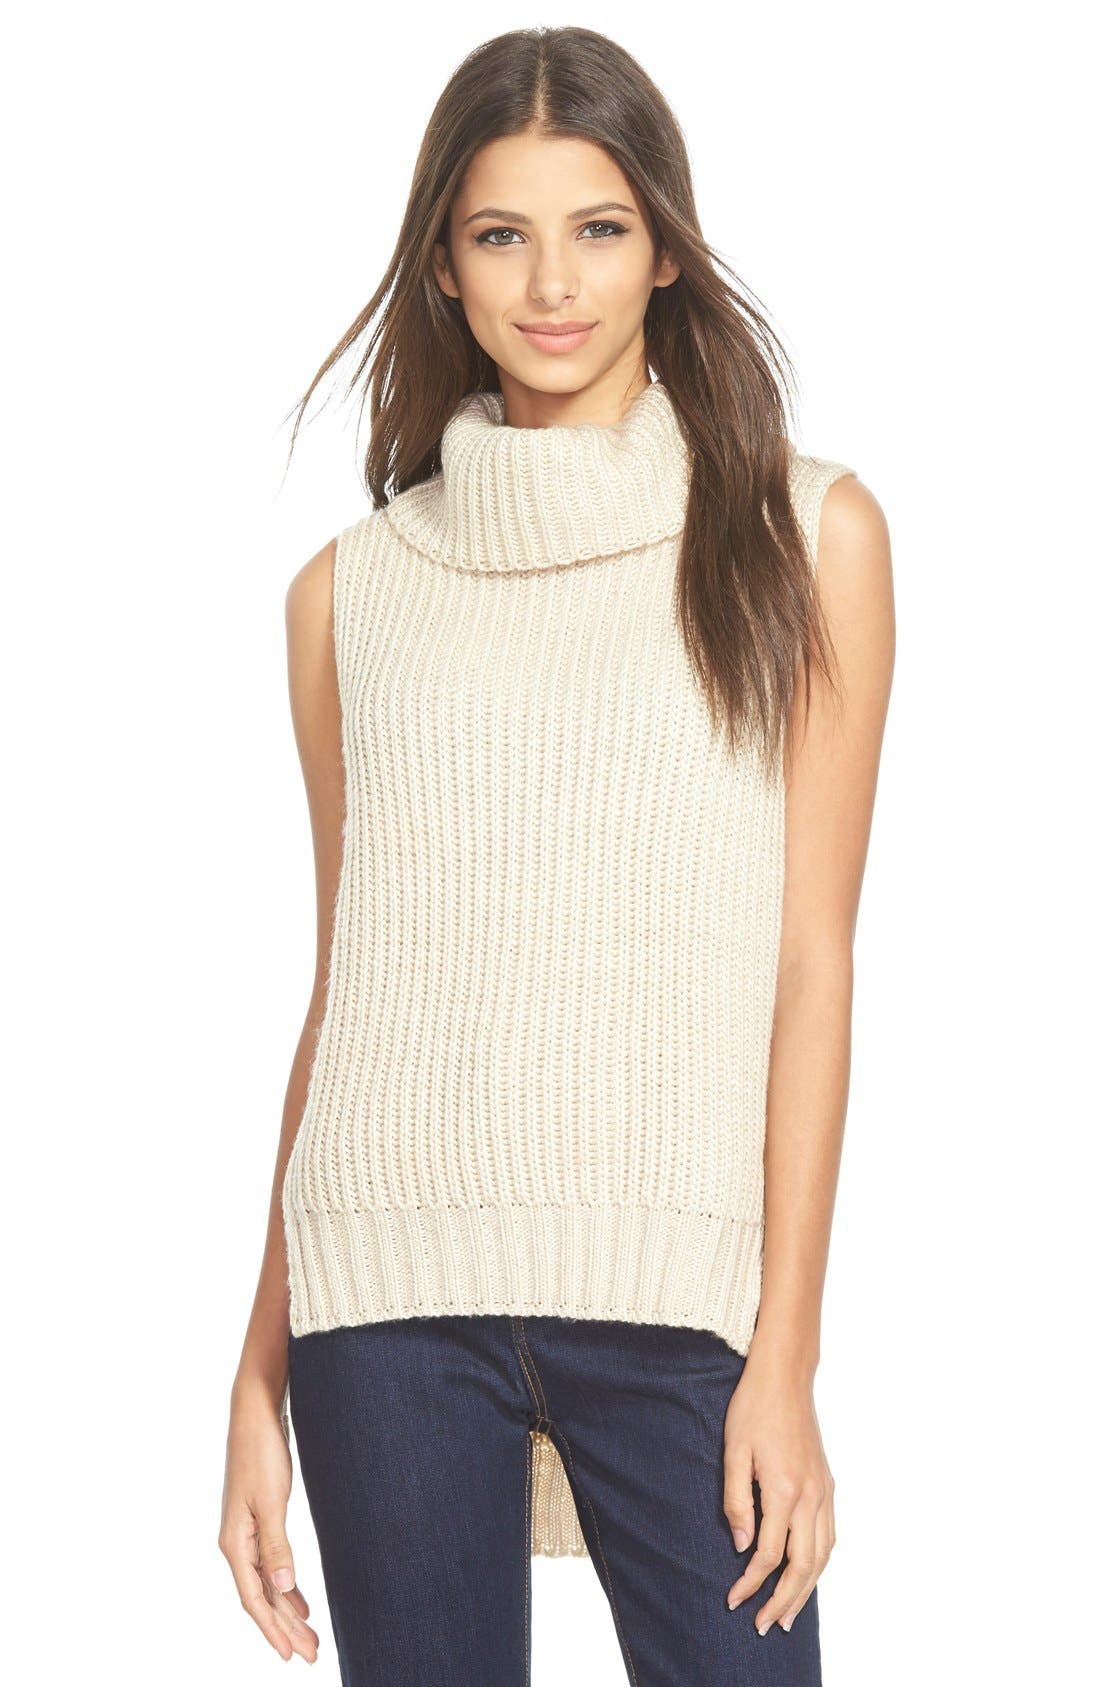 Alternate Image 1 Selected - ASTR High/Low Turtleneck Sweater